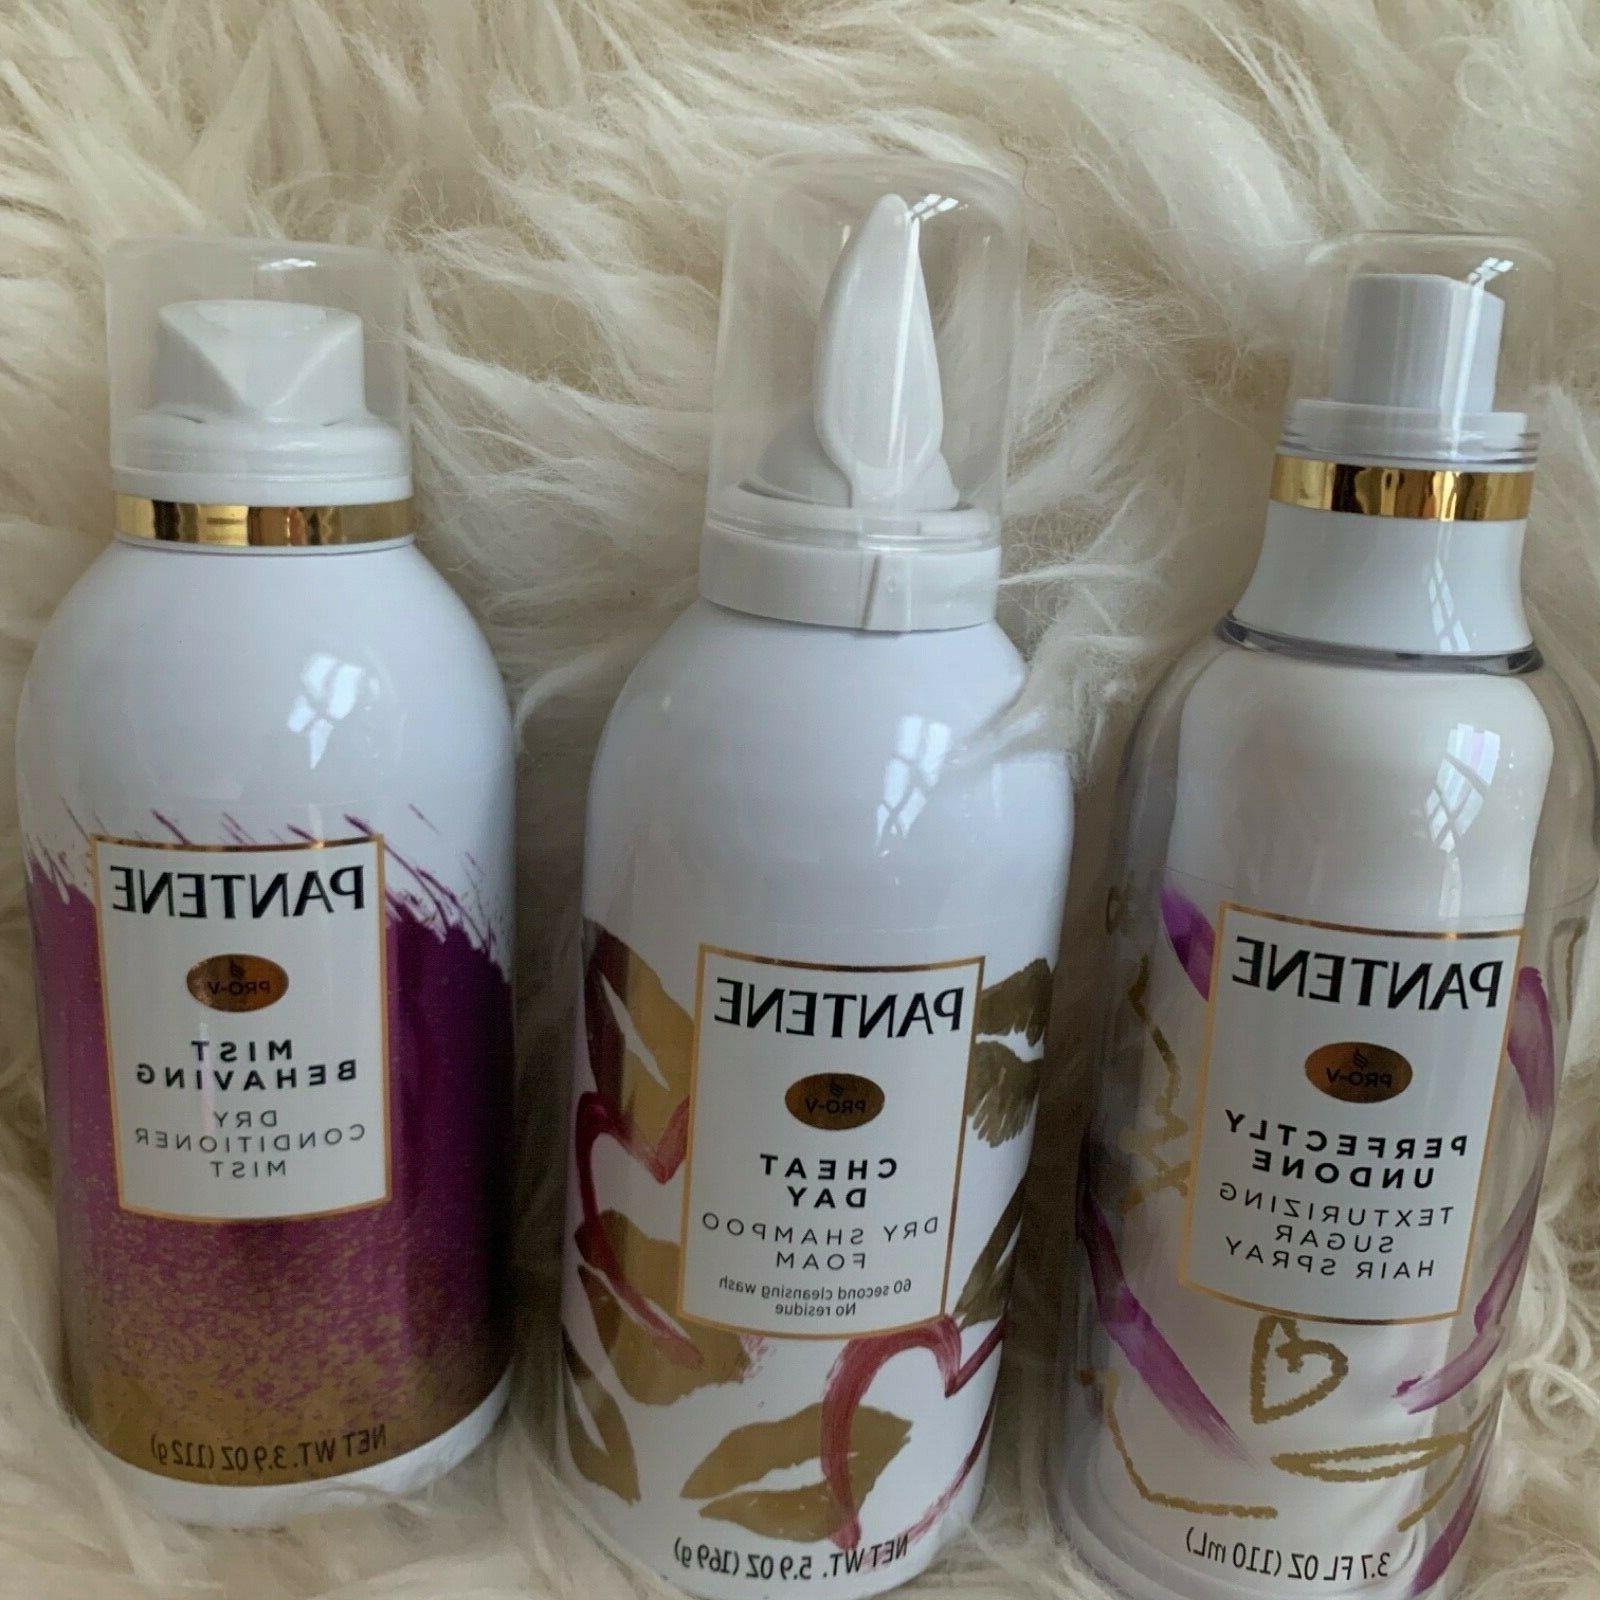 Pantene Shampoo Dry Conditioner Mist Sugar Hair Waterless